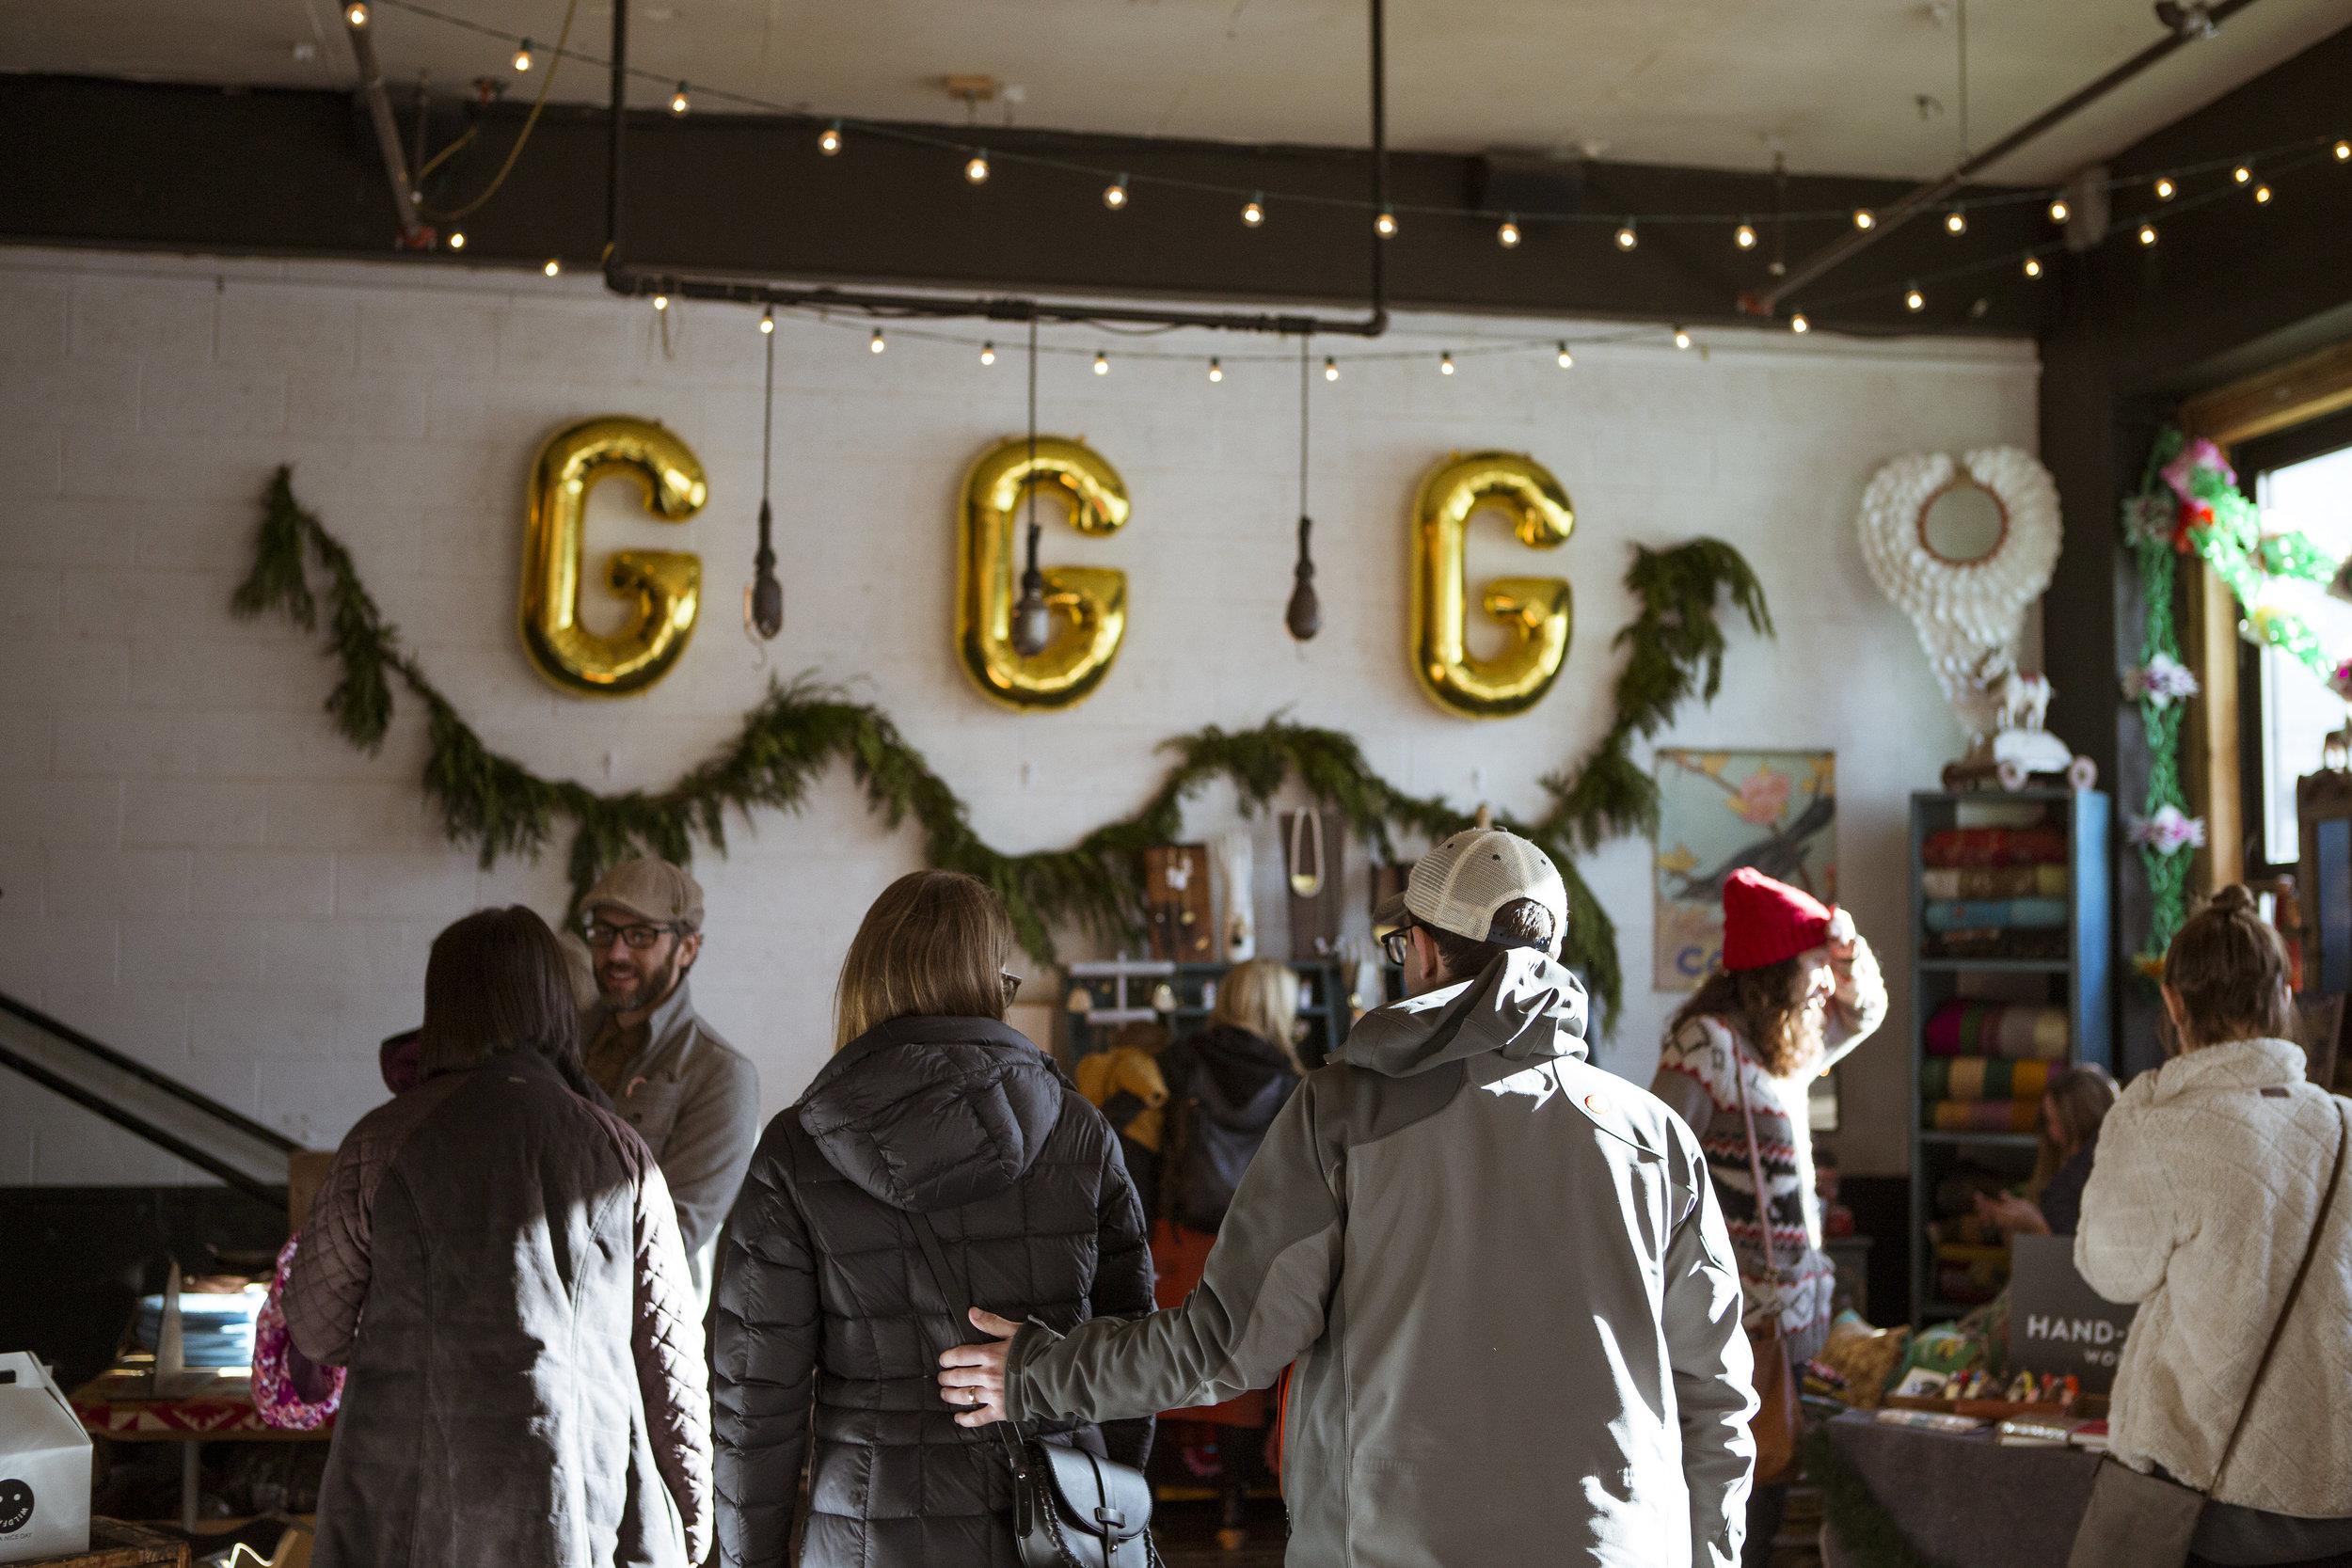 Give-Good-Gift-Portland-51.jpg